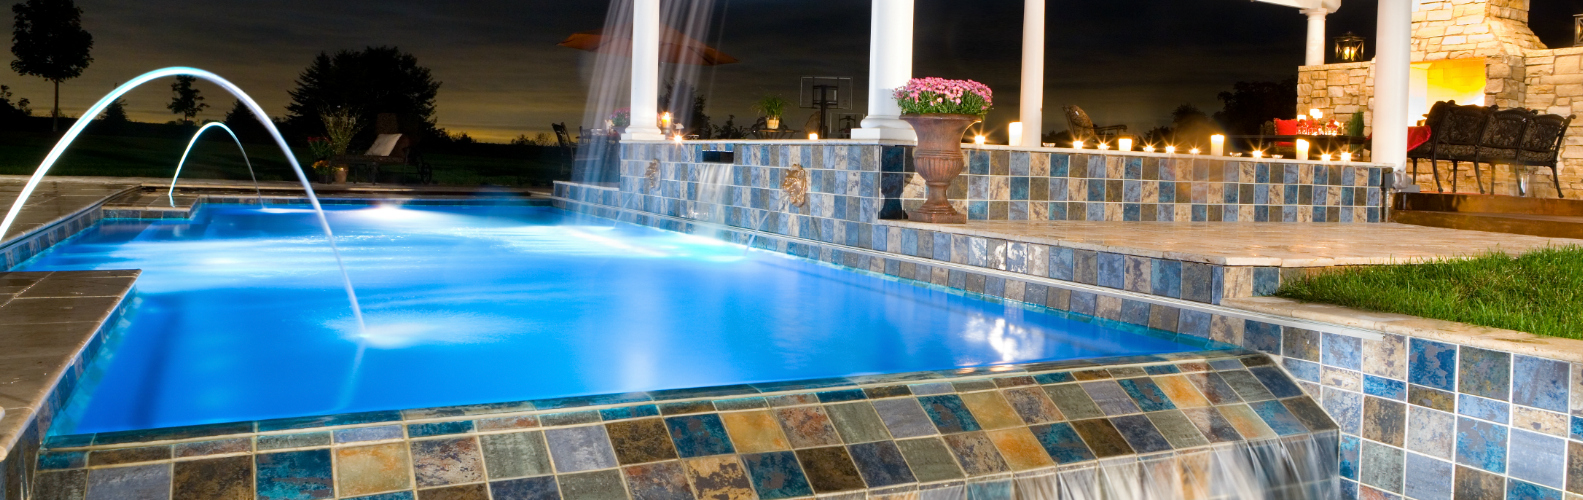 Pool Decks & Patios